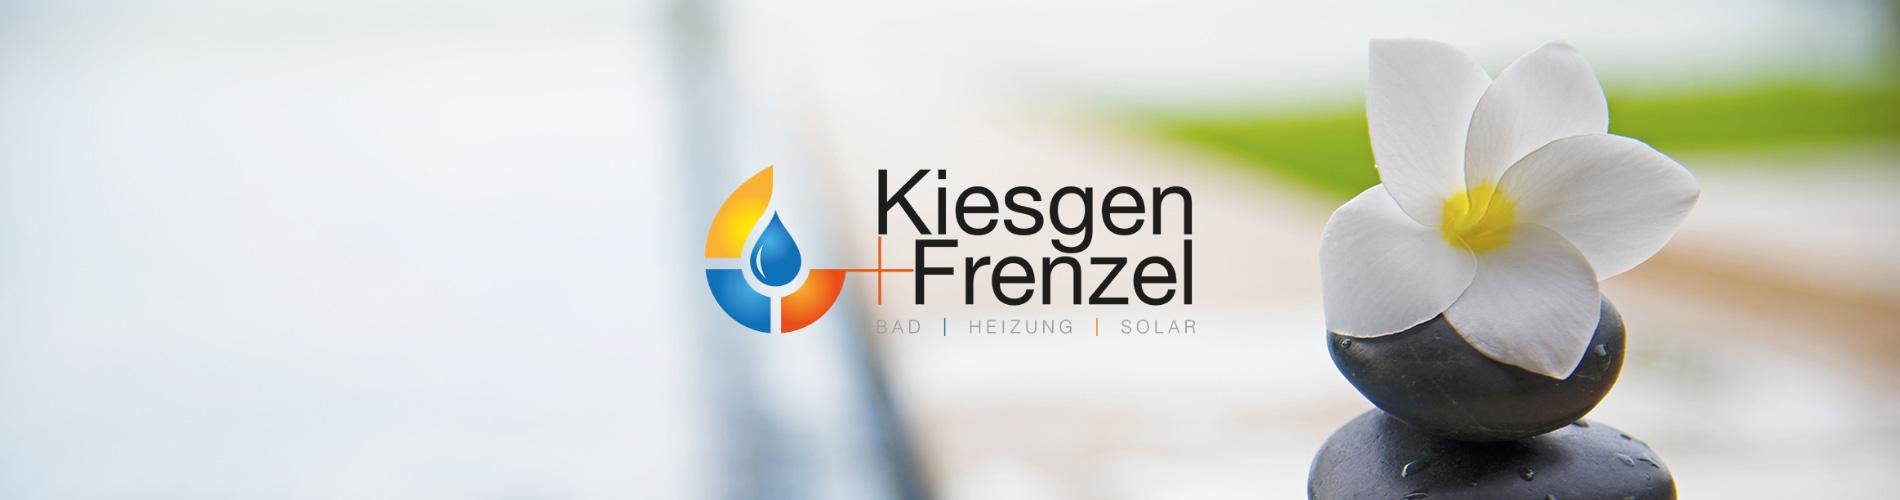 Kiesgen+Frenzel Kinospot im Mosel-Kino Bernkastel-Kues